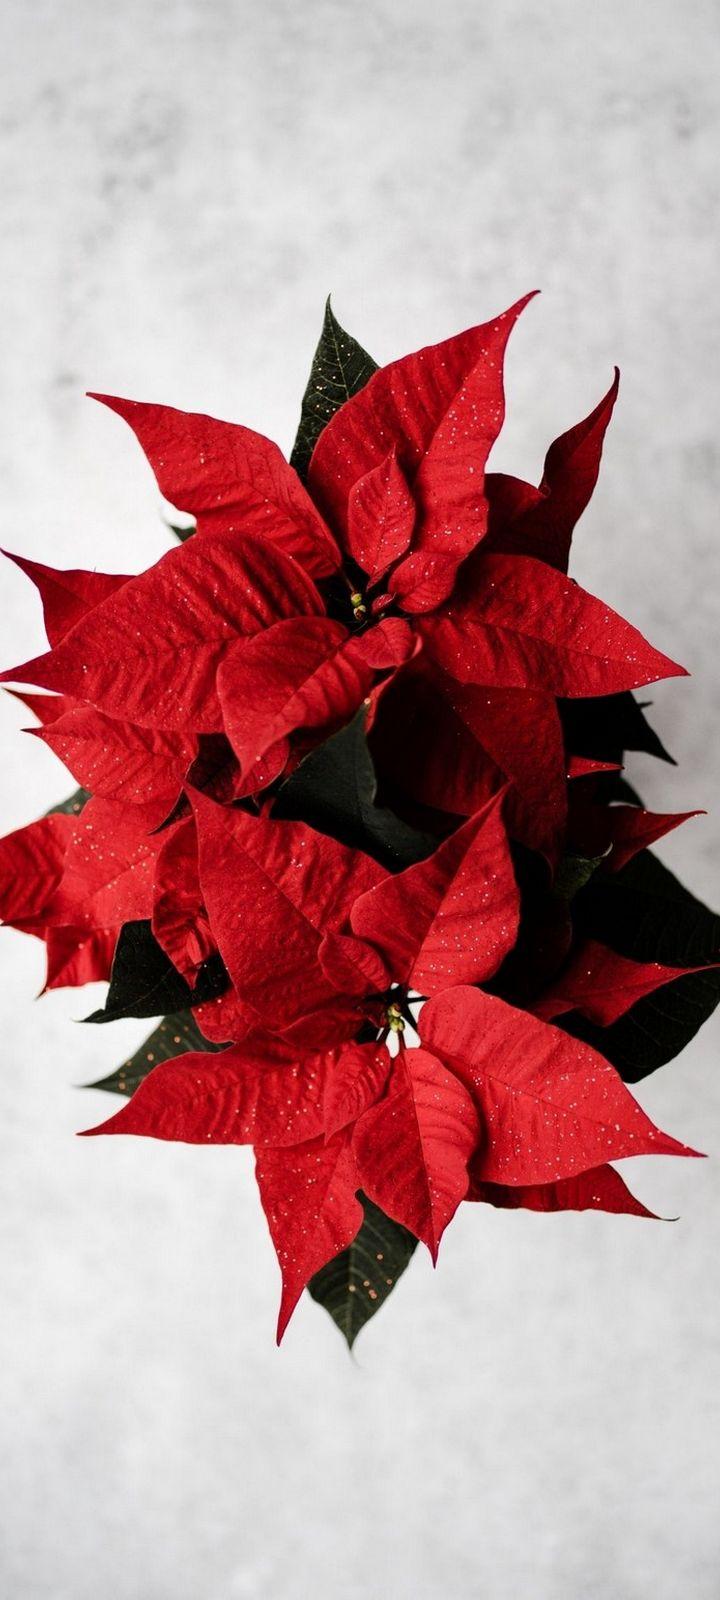 Poinsettia Red Flower Wallpaper 720x1600